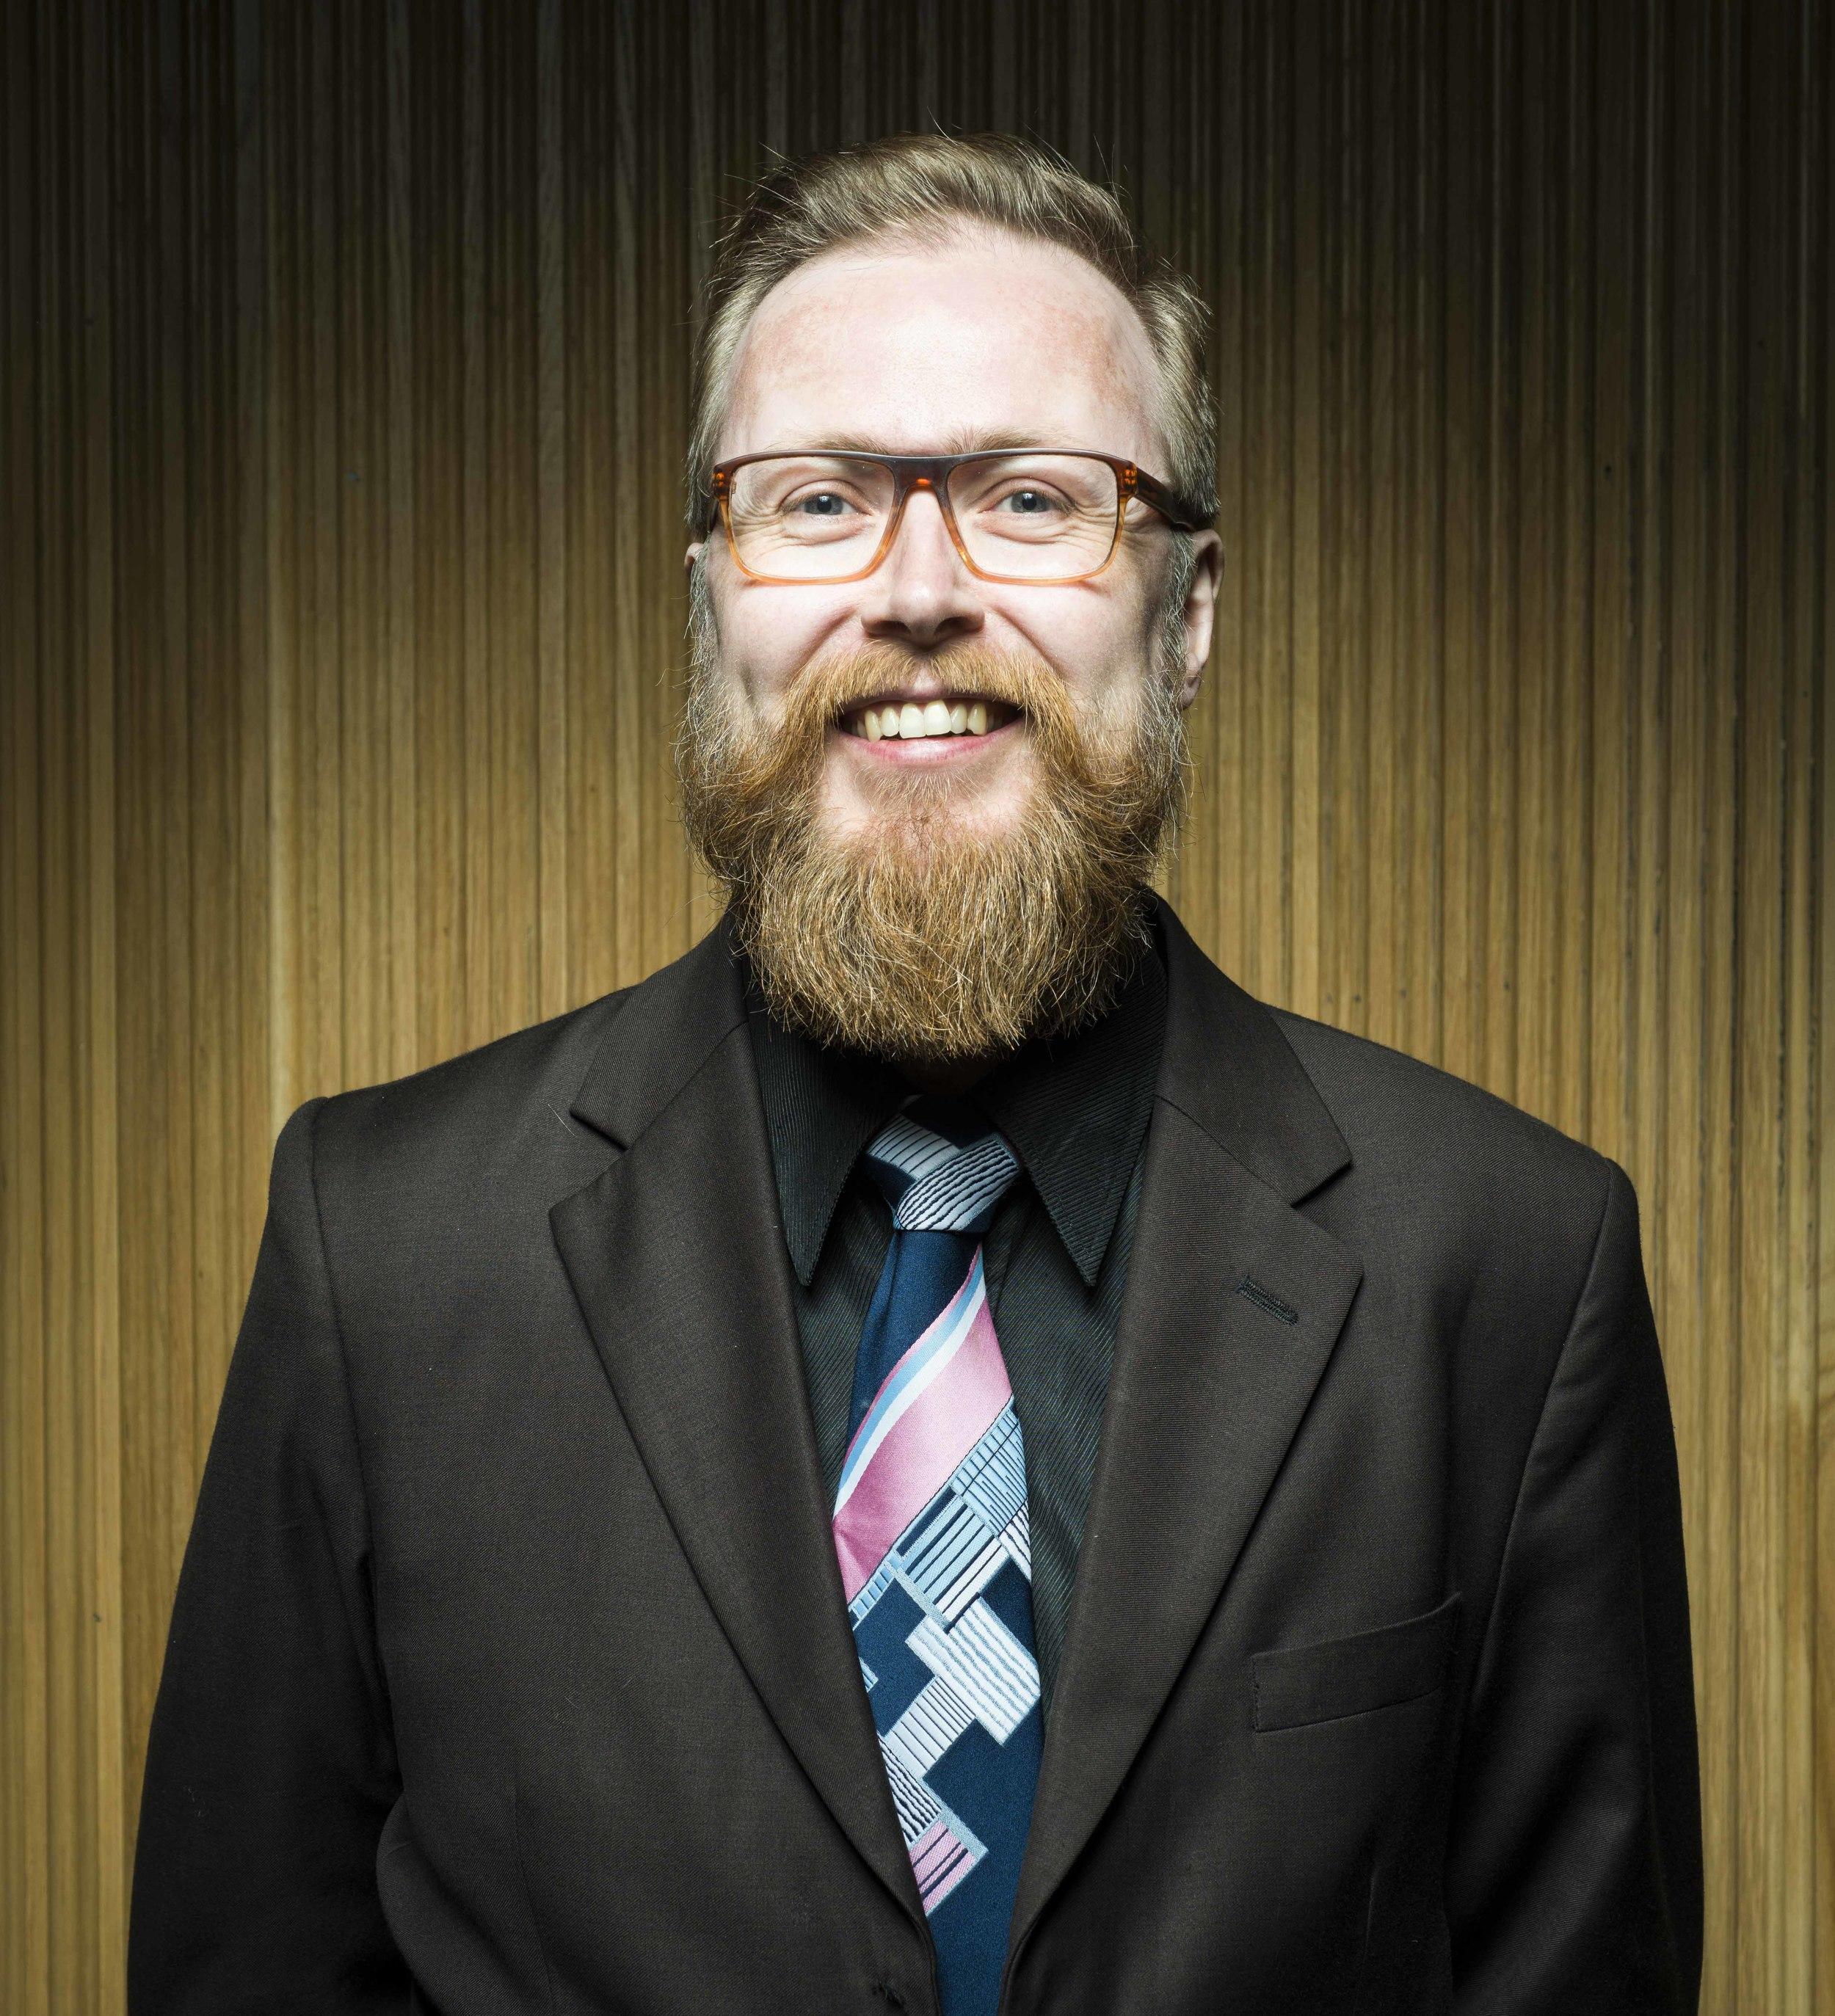 Thorolf Thuestad – Electronics - Photo: Thor Brødreskift